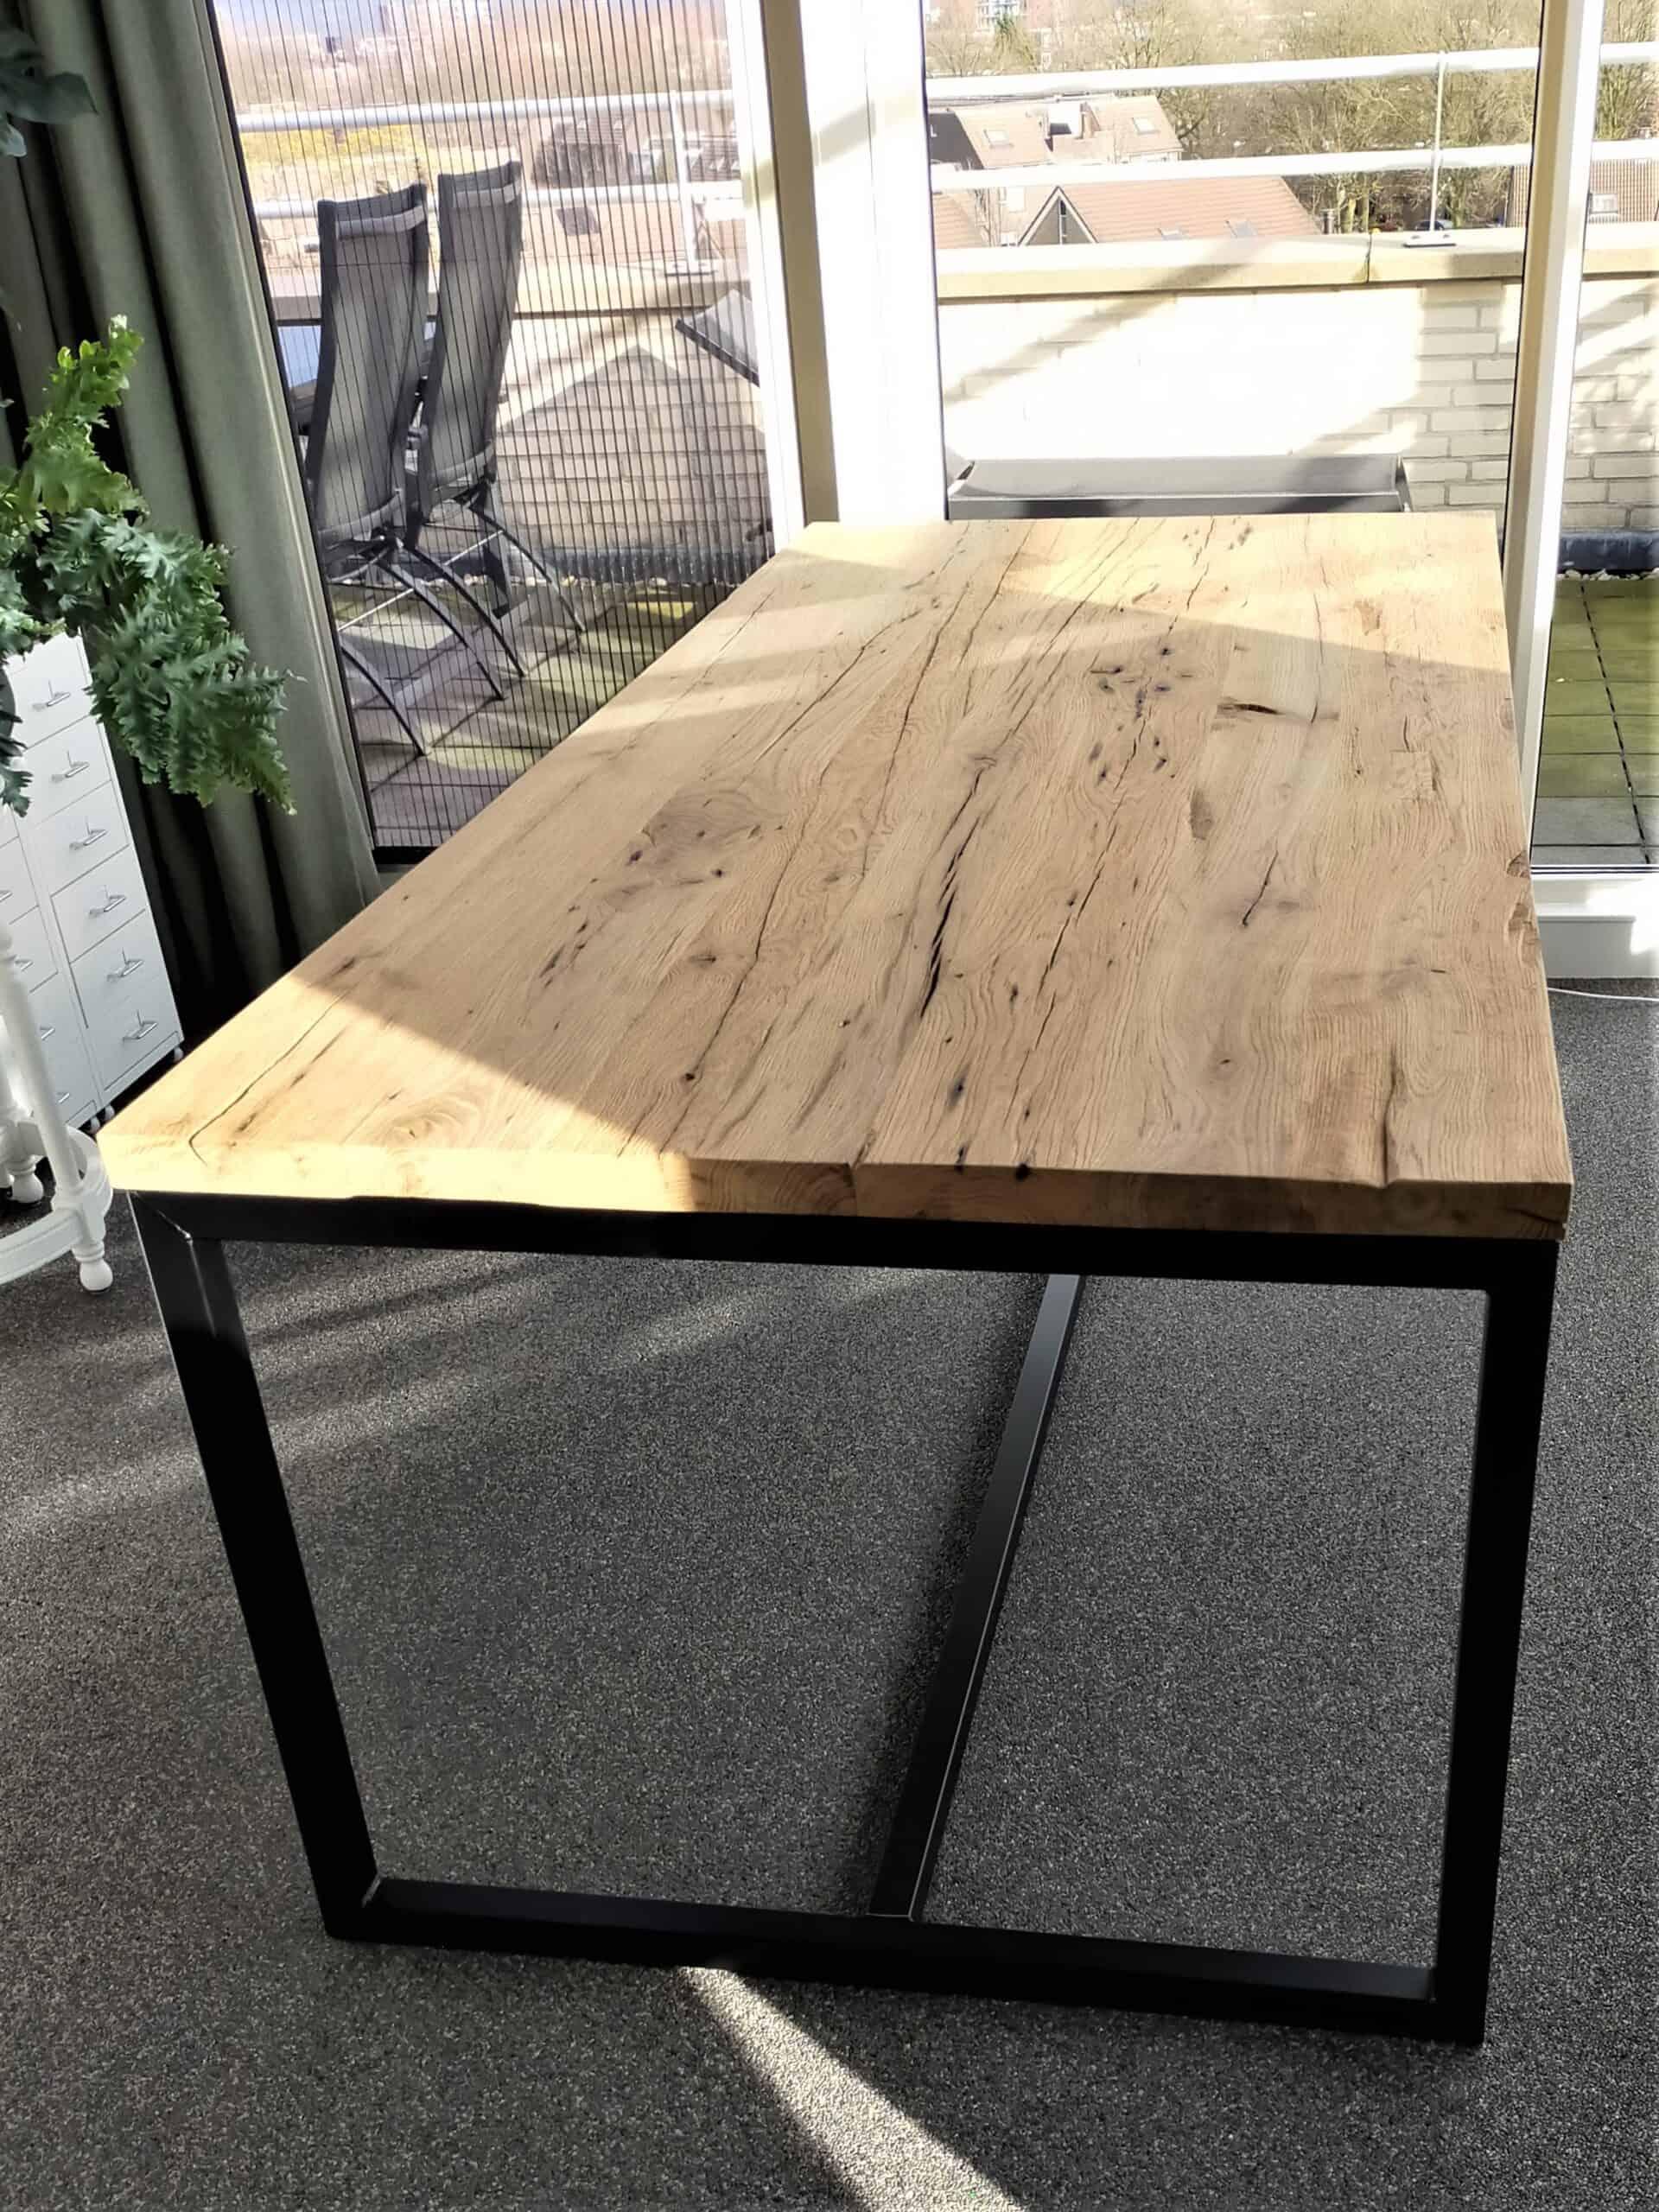 Geschaafd oud eiken tafel 220x100x4 met stalen frame